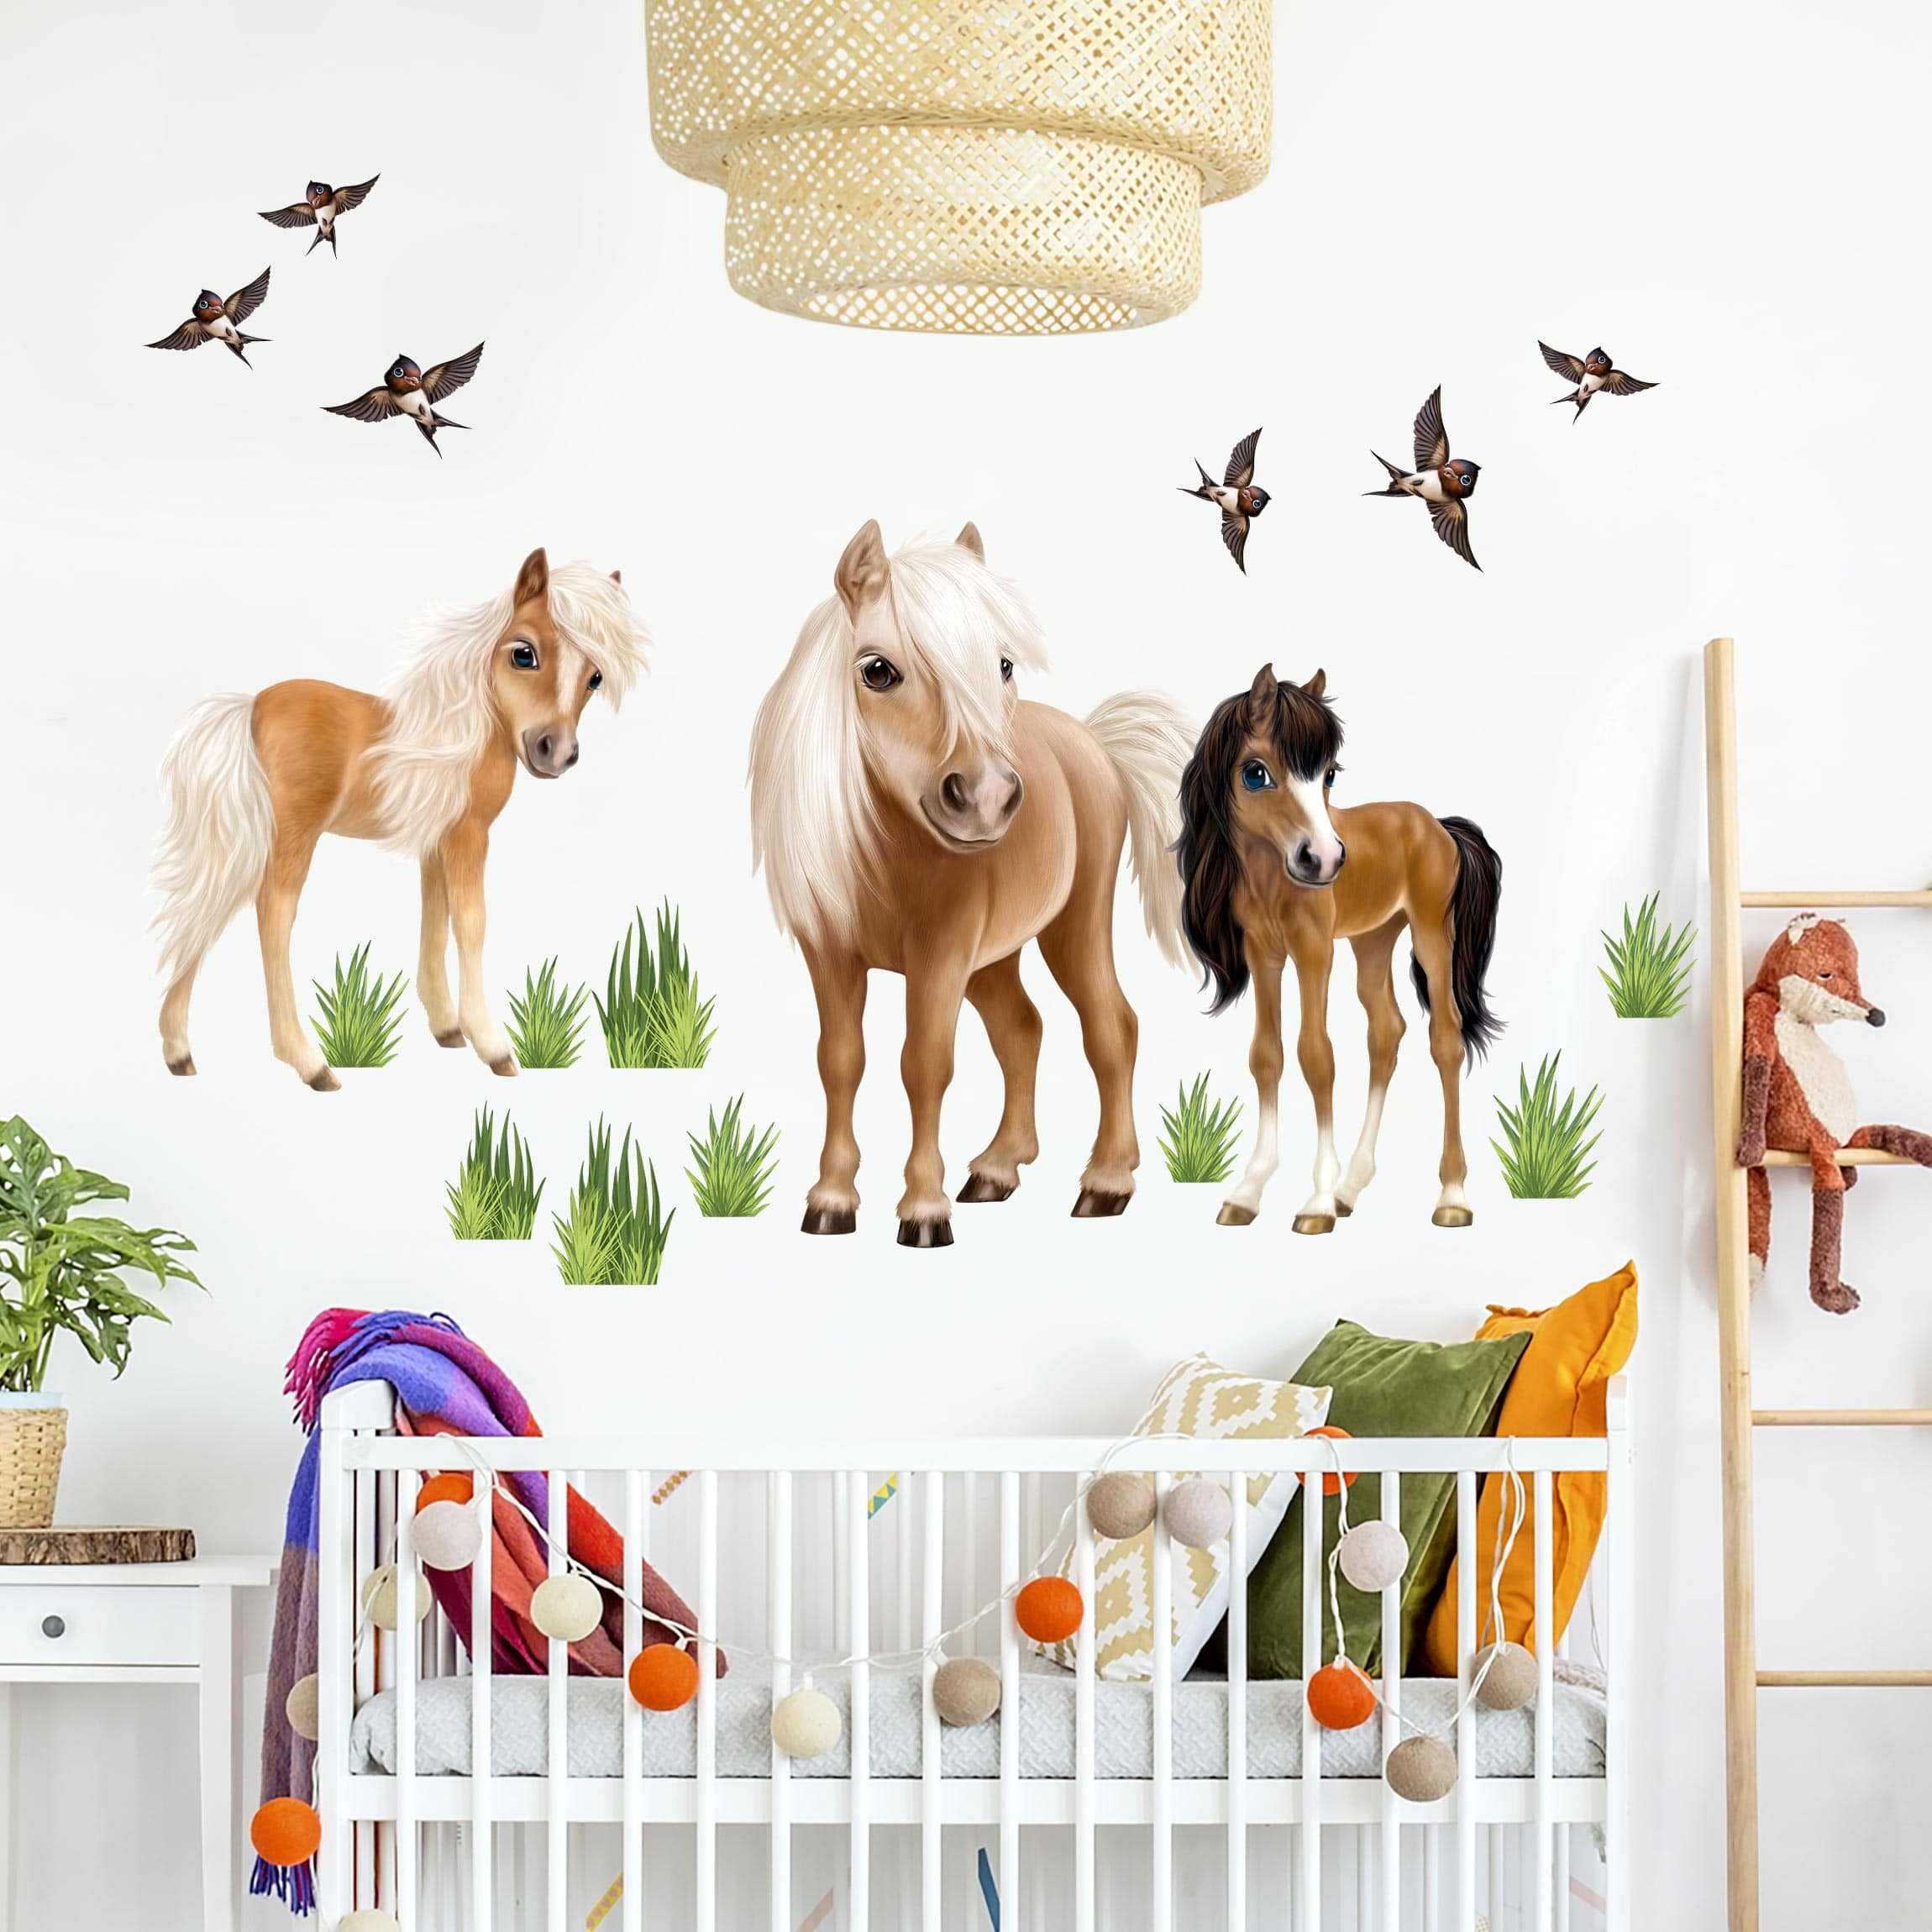 Full Size of Kinderzimmer Pferd Wandtattoo Animal Club International Set Pferde Sofa Regal Weiß Regale Kinderzimmer Kinderzimmer Pferd